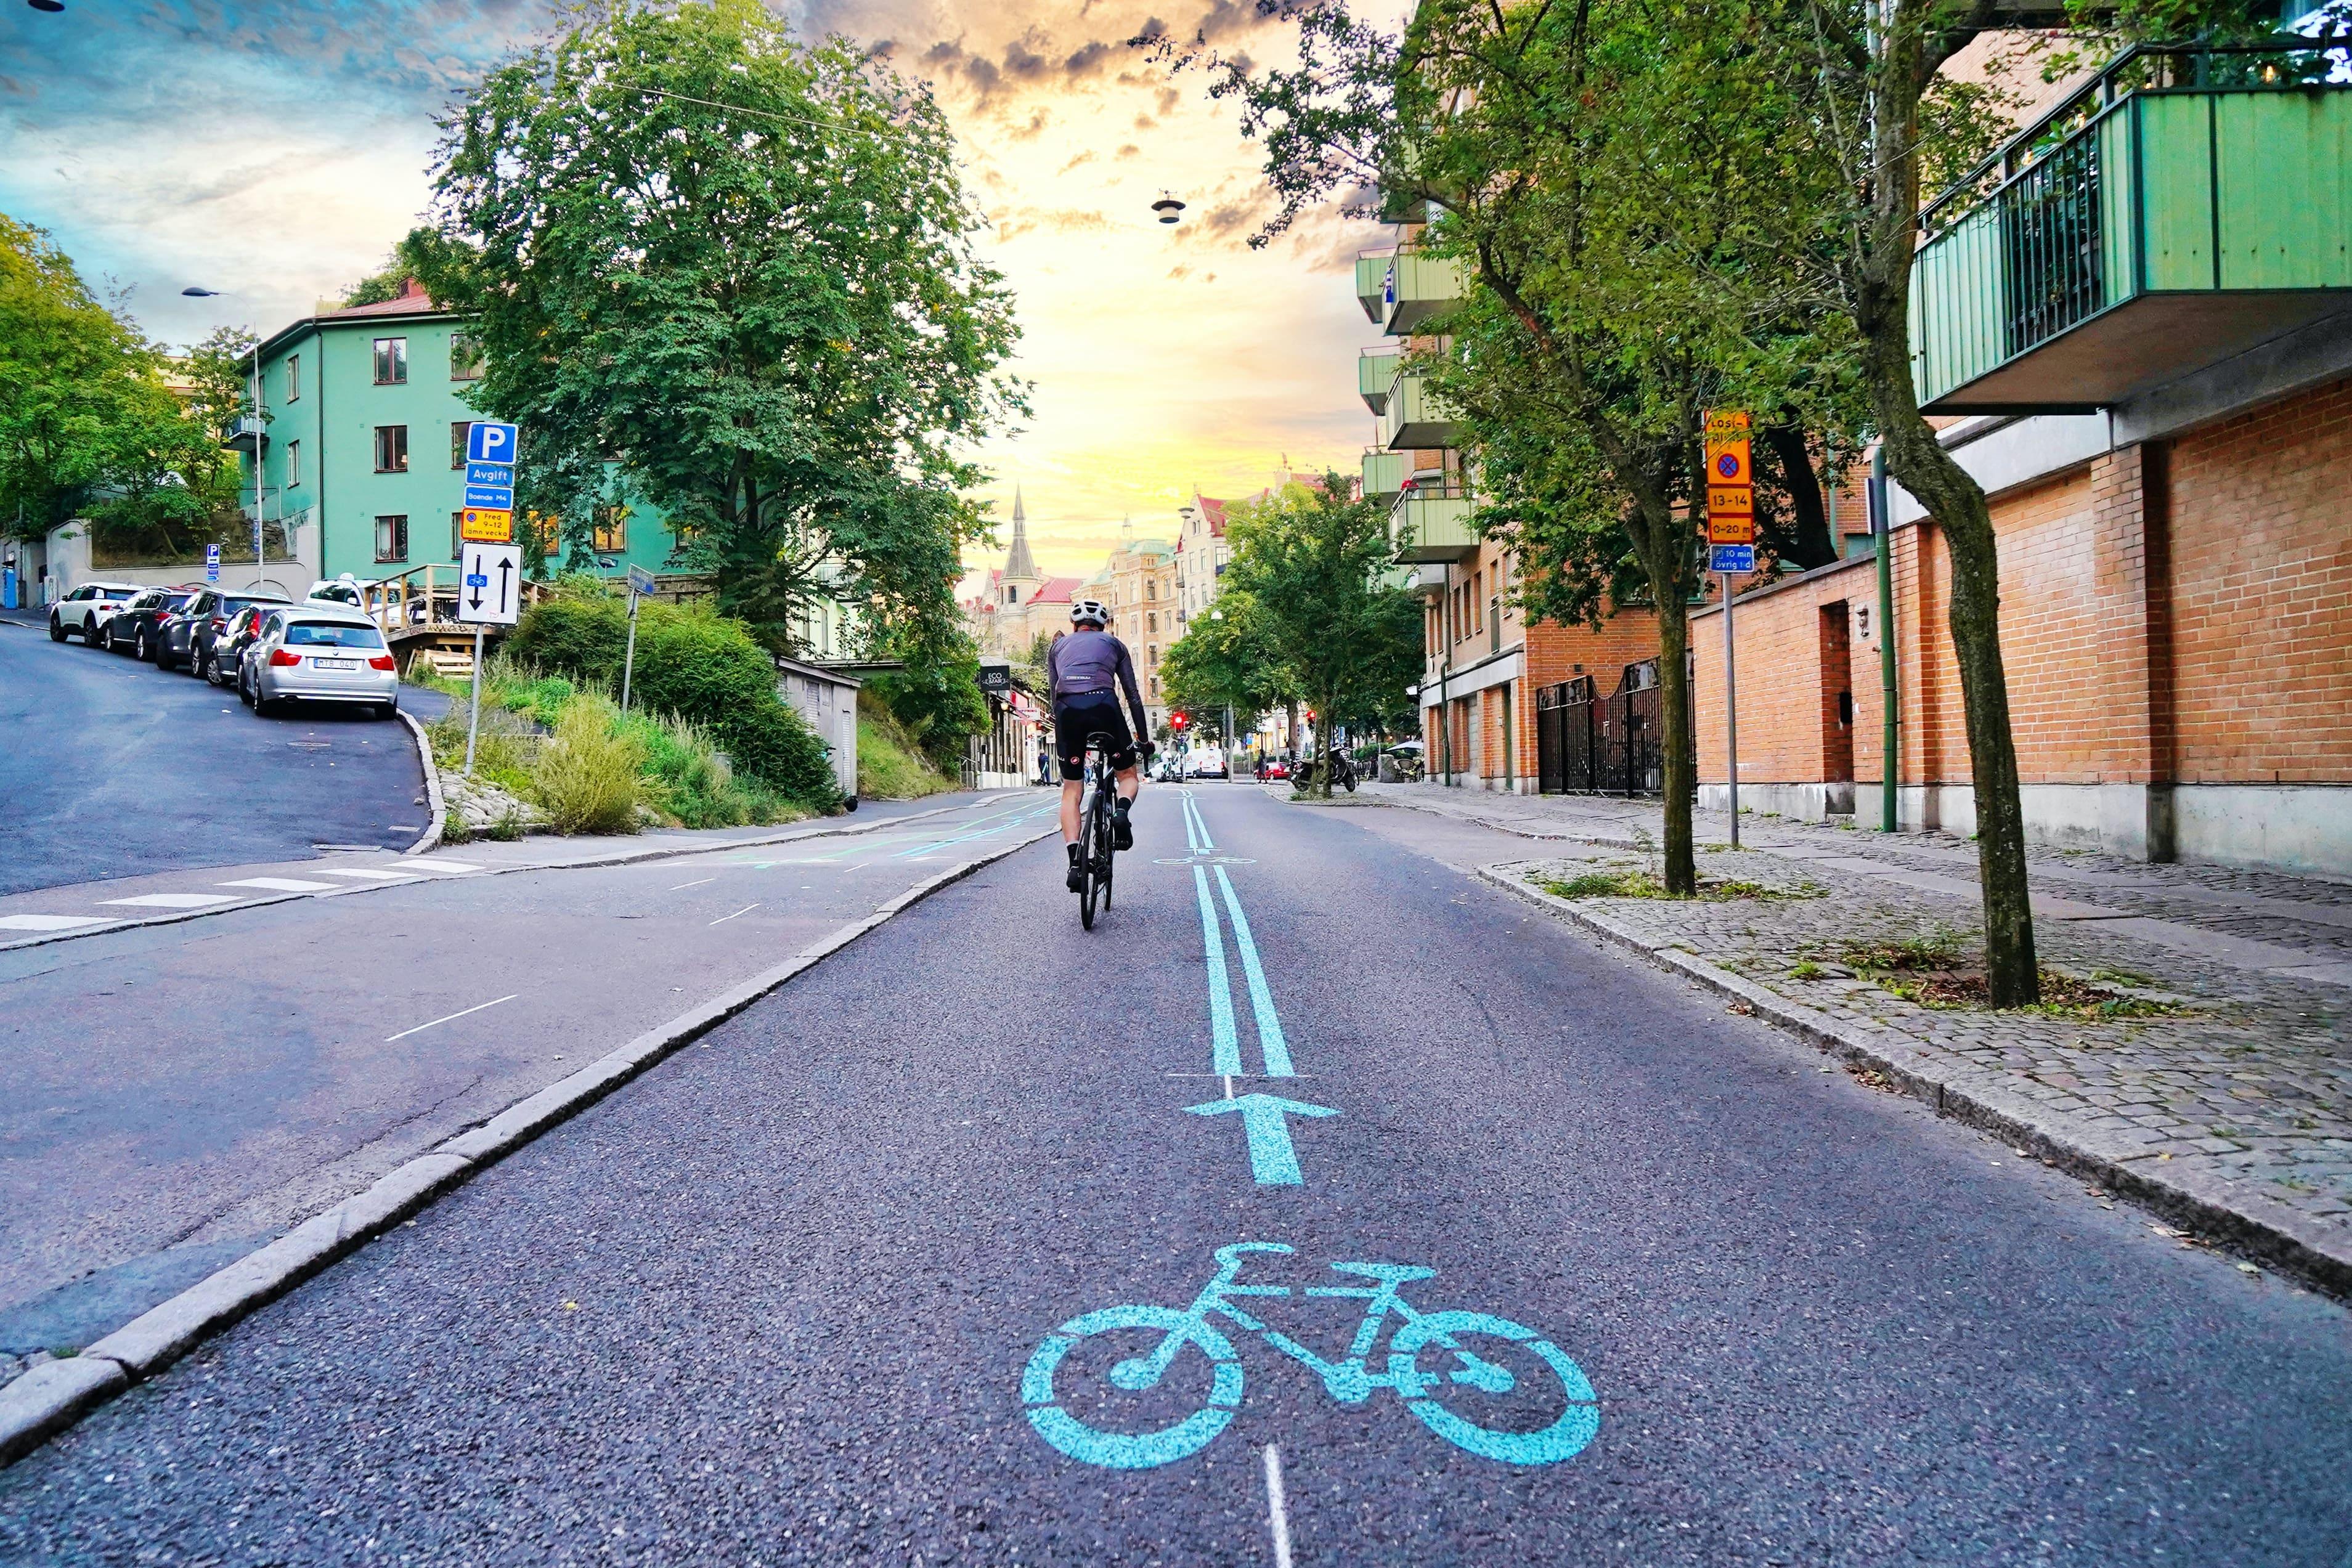 Cyclist on cycling lane